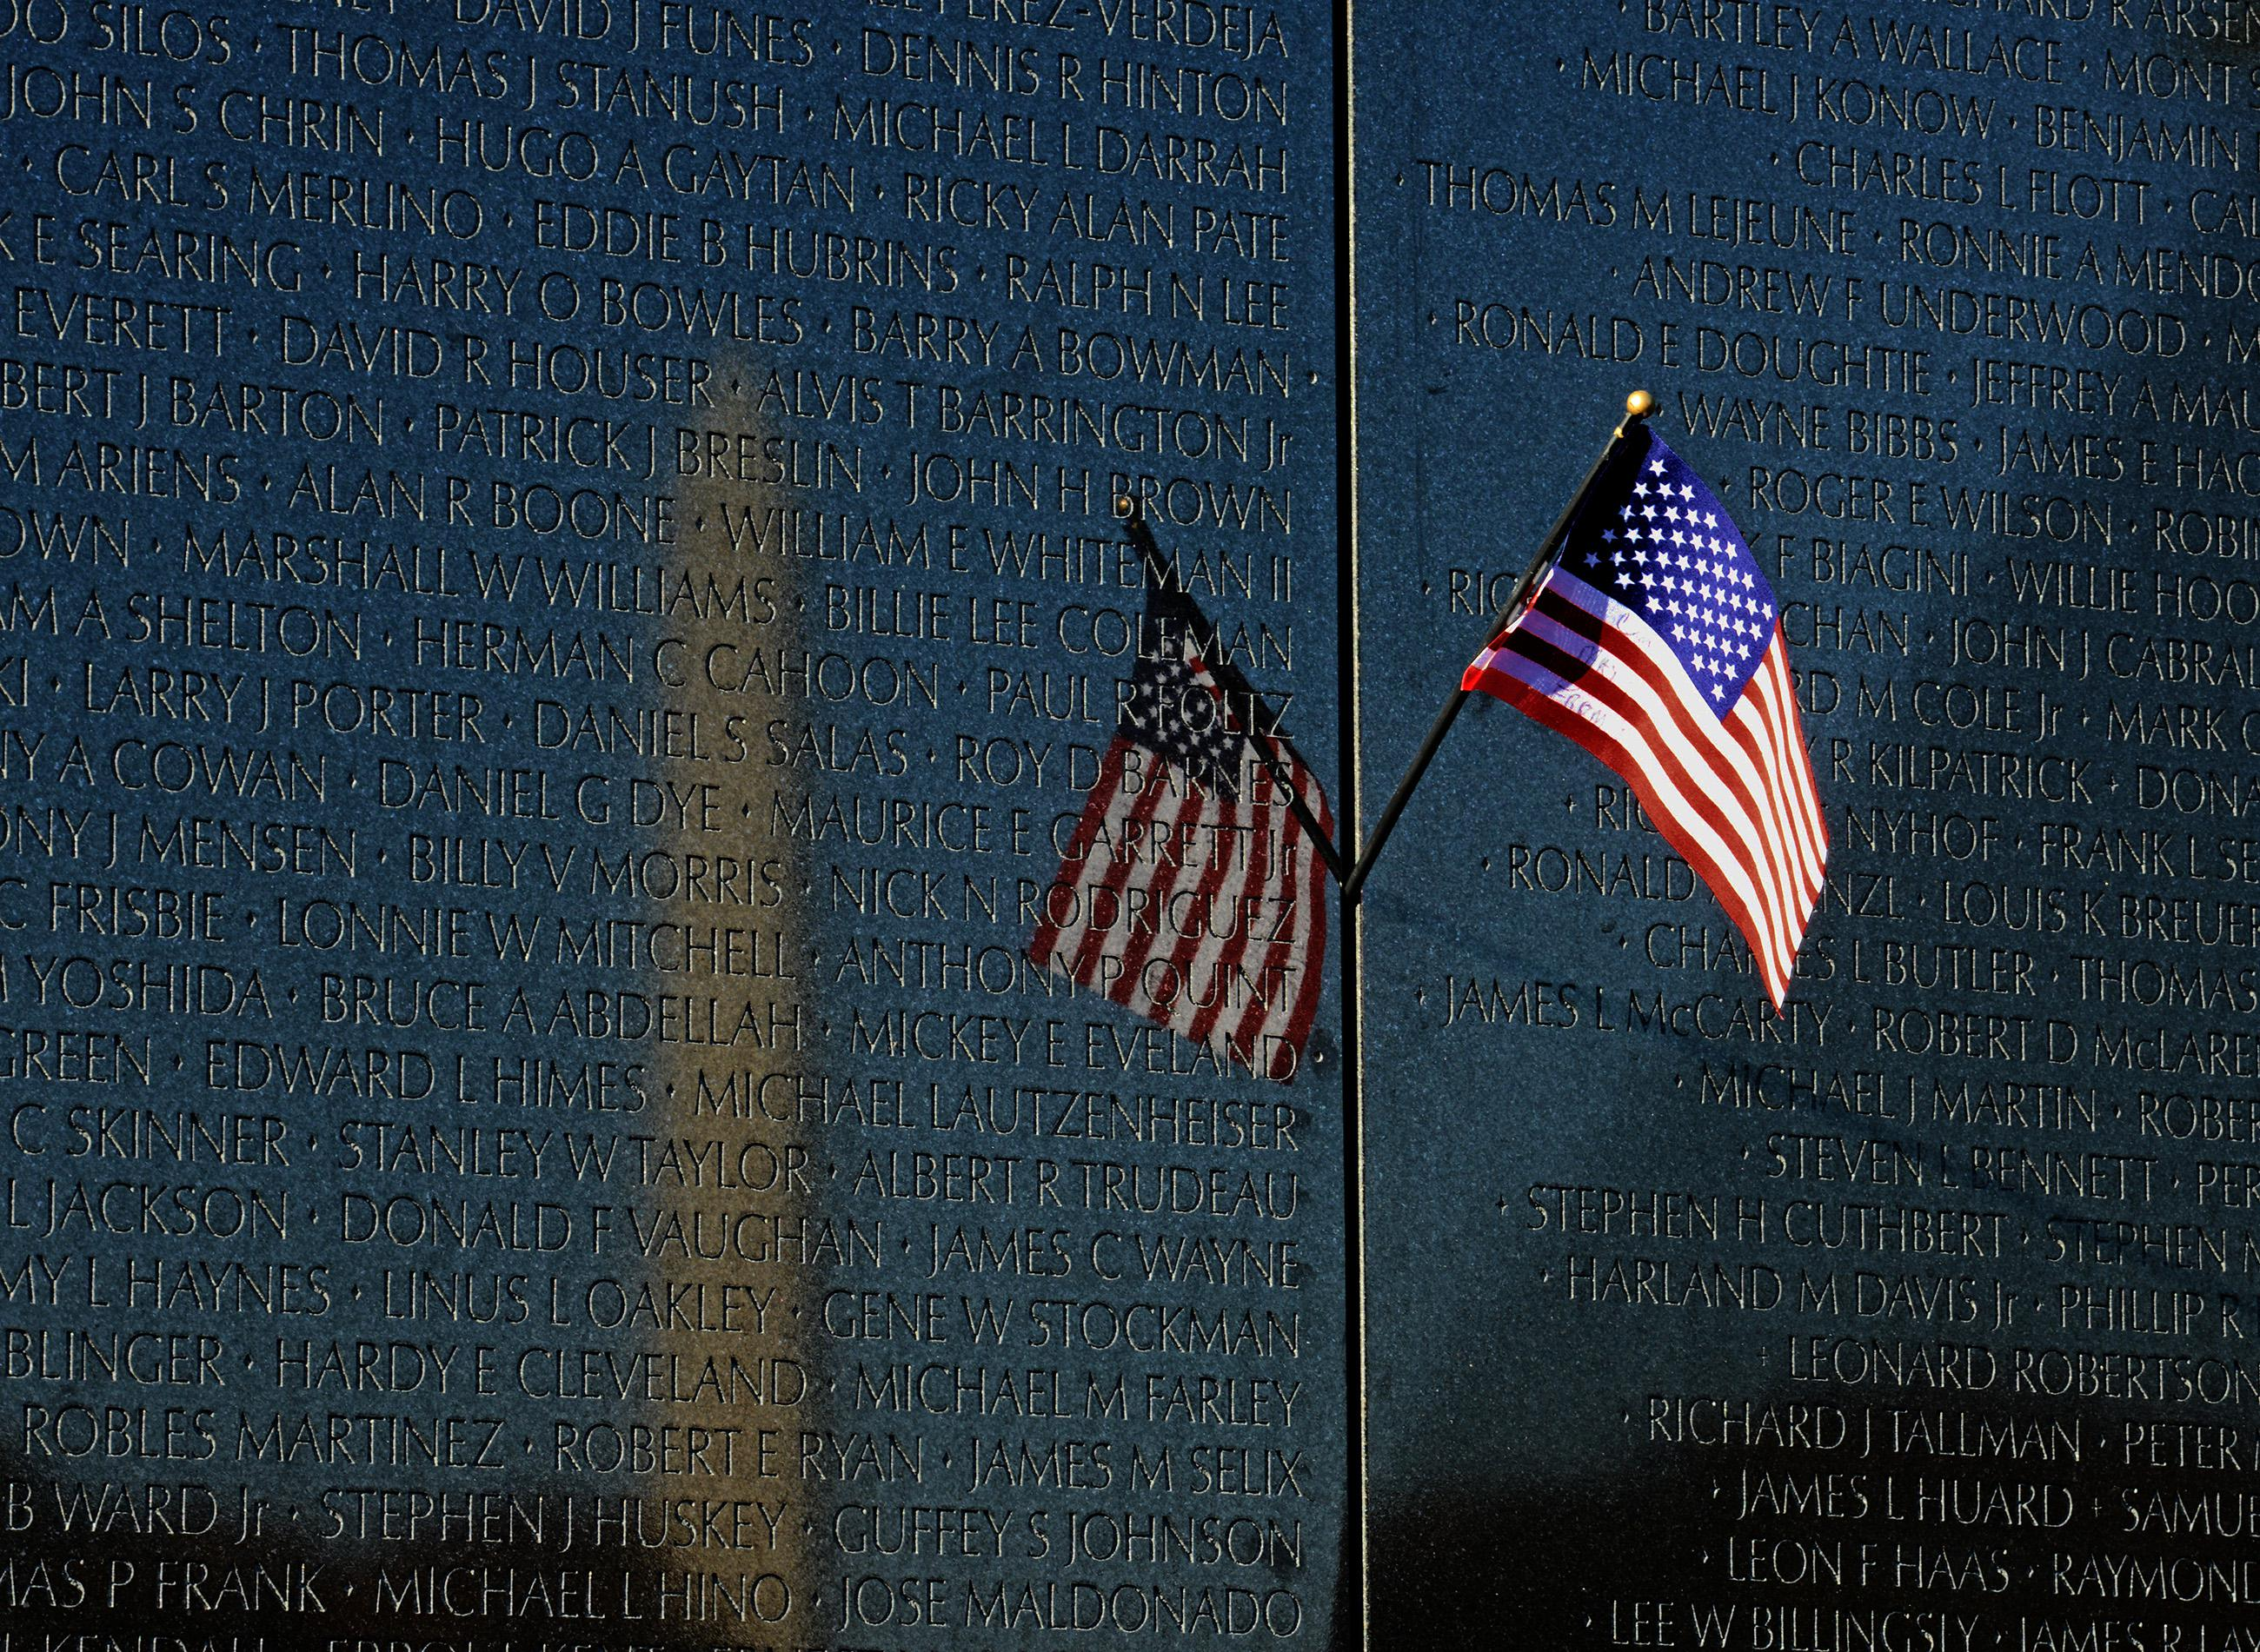 Veterans Day at the Vietnam War Memorial in Washington, DC.